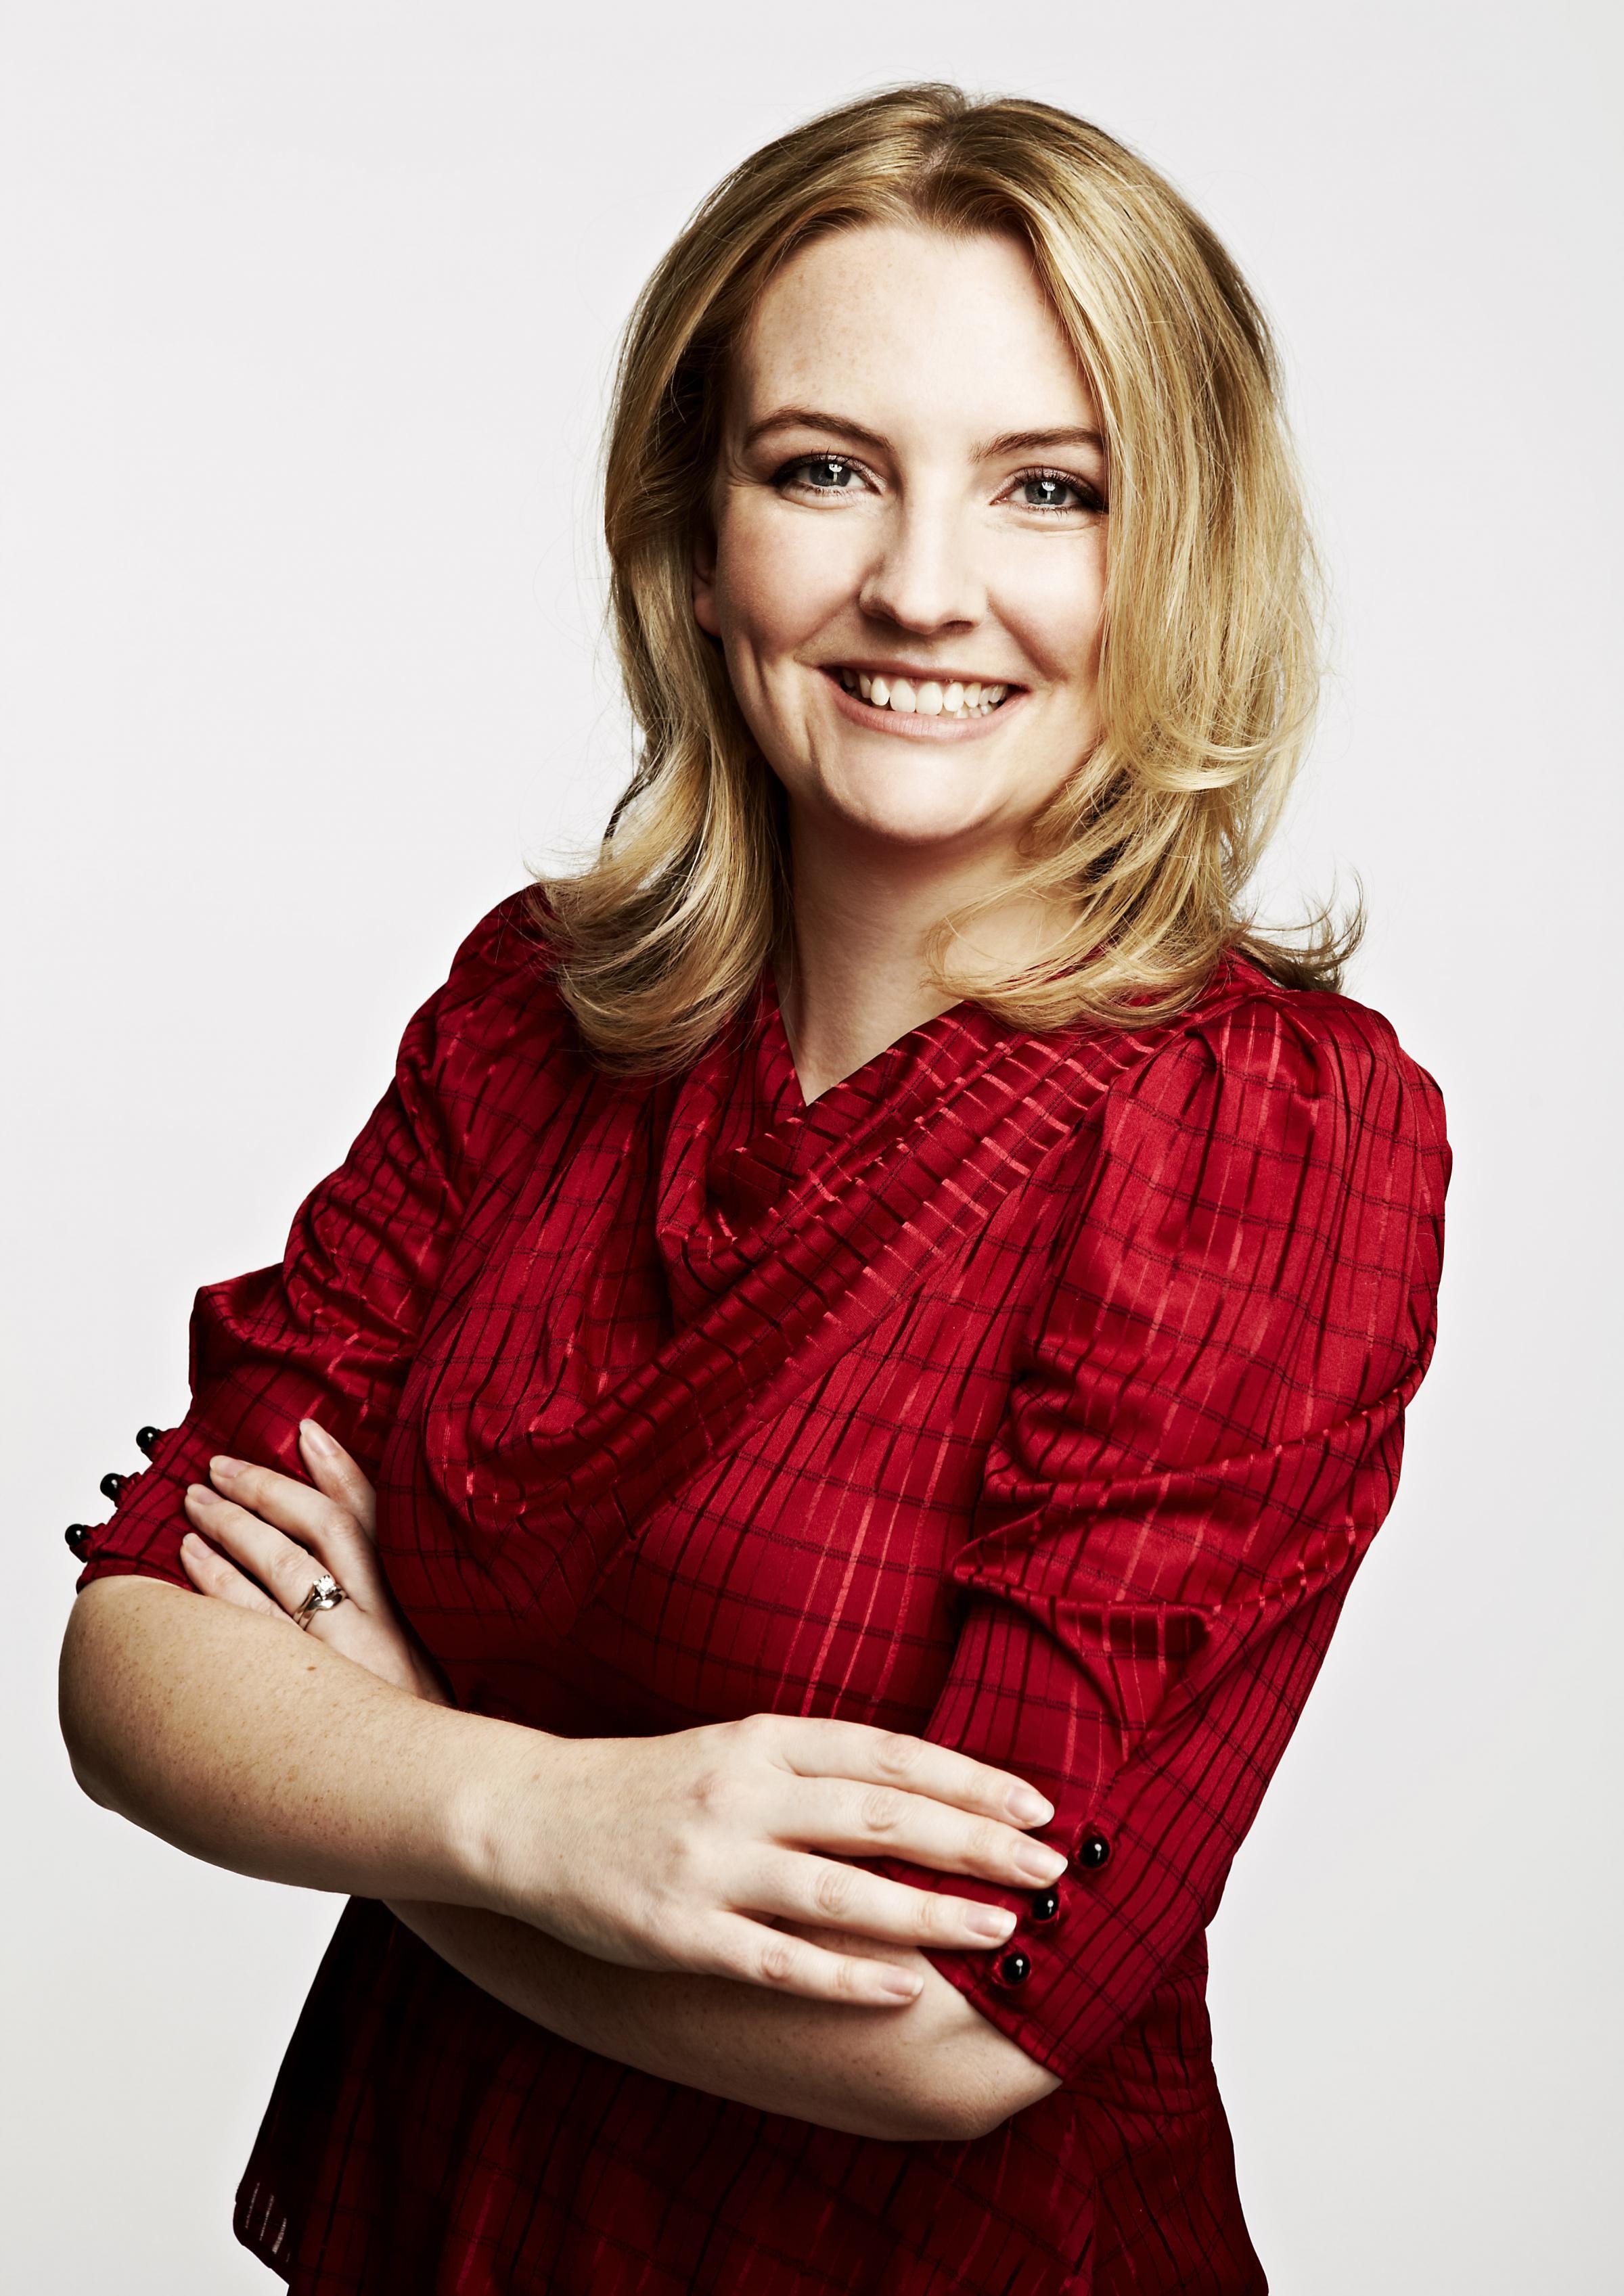 Angela Clarke Net Worth